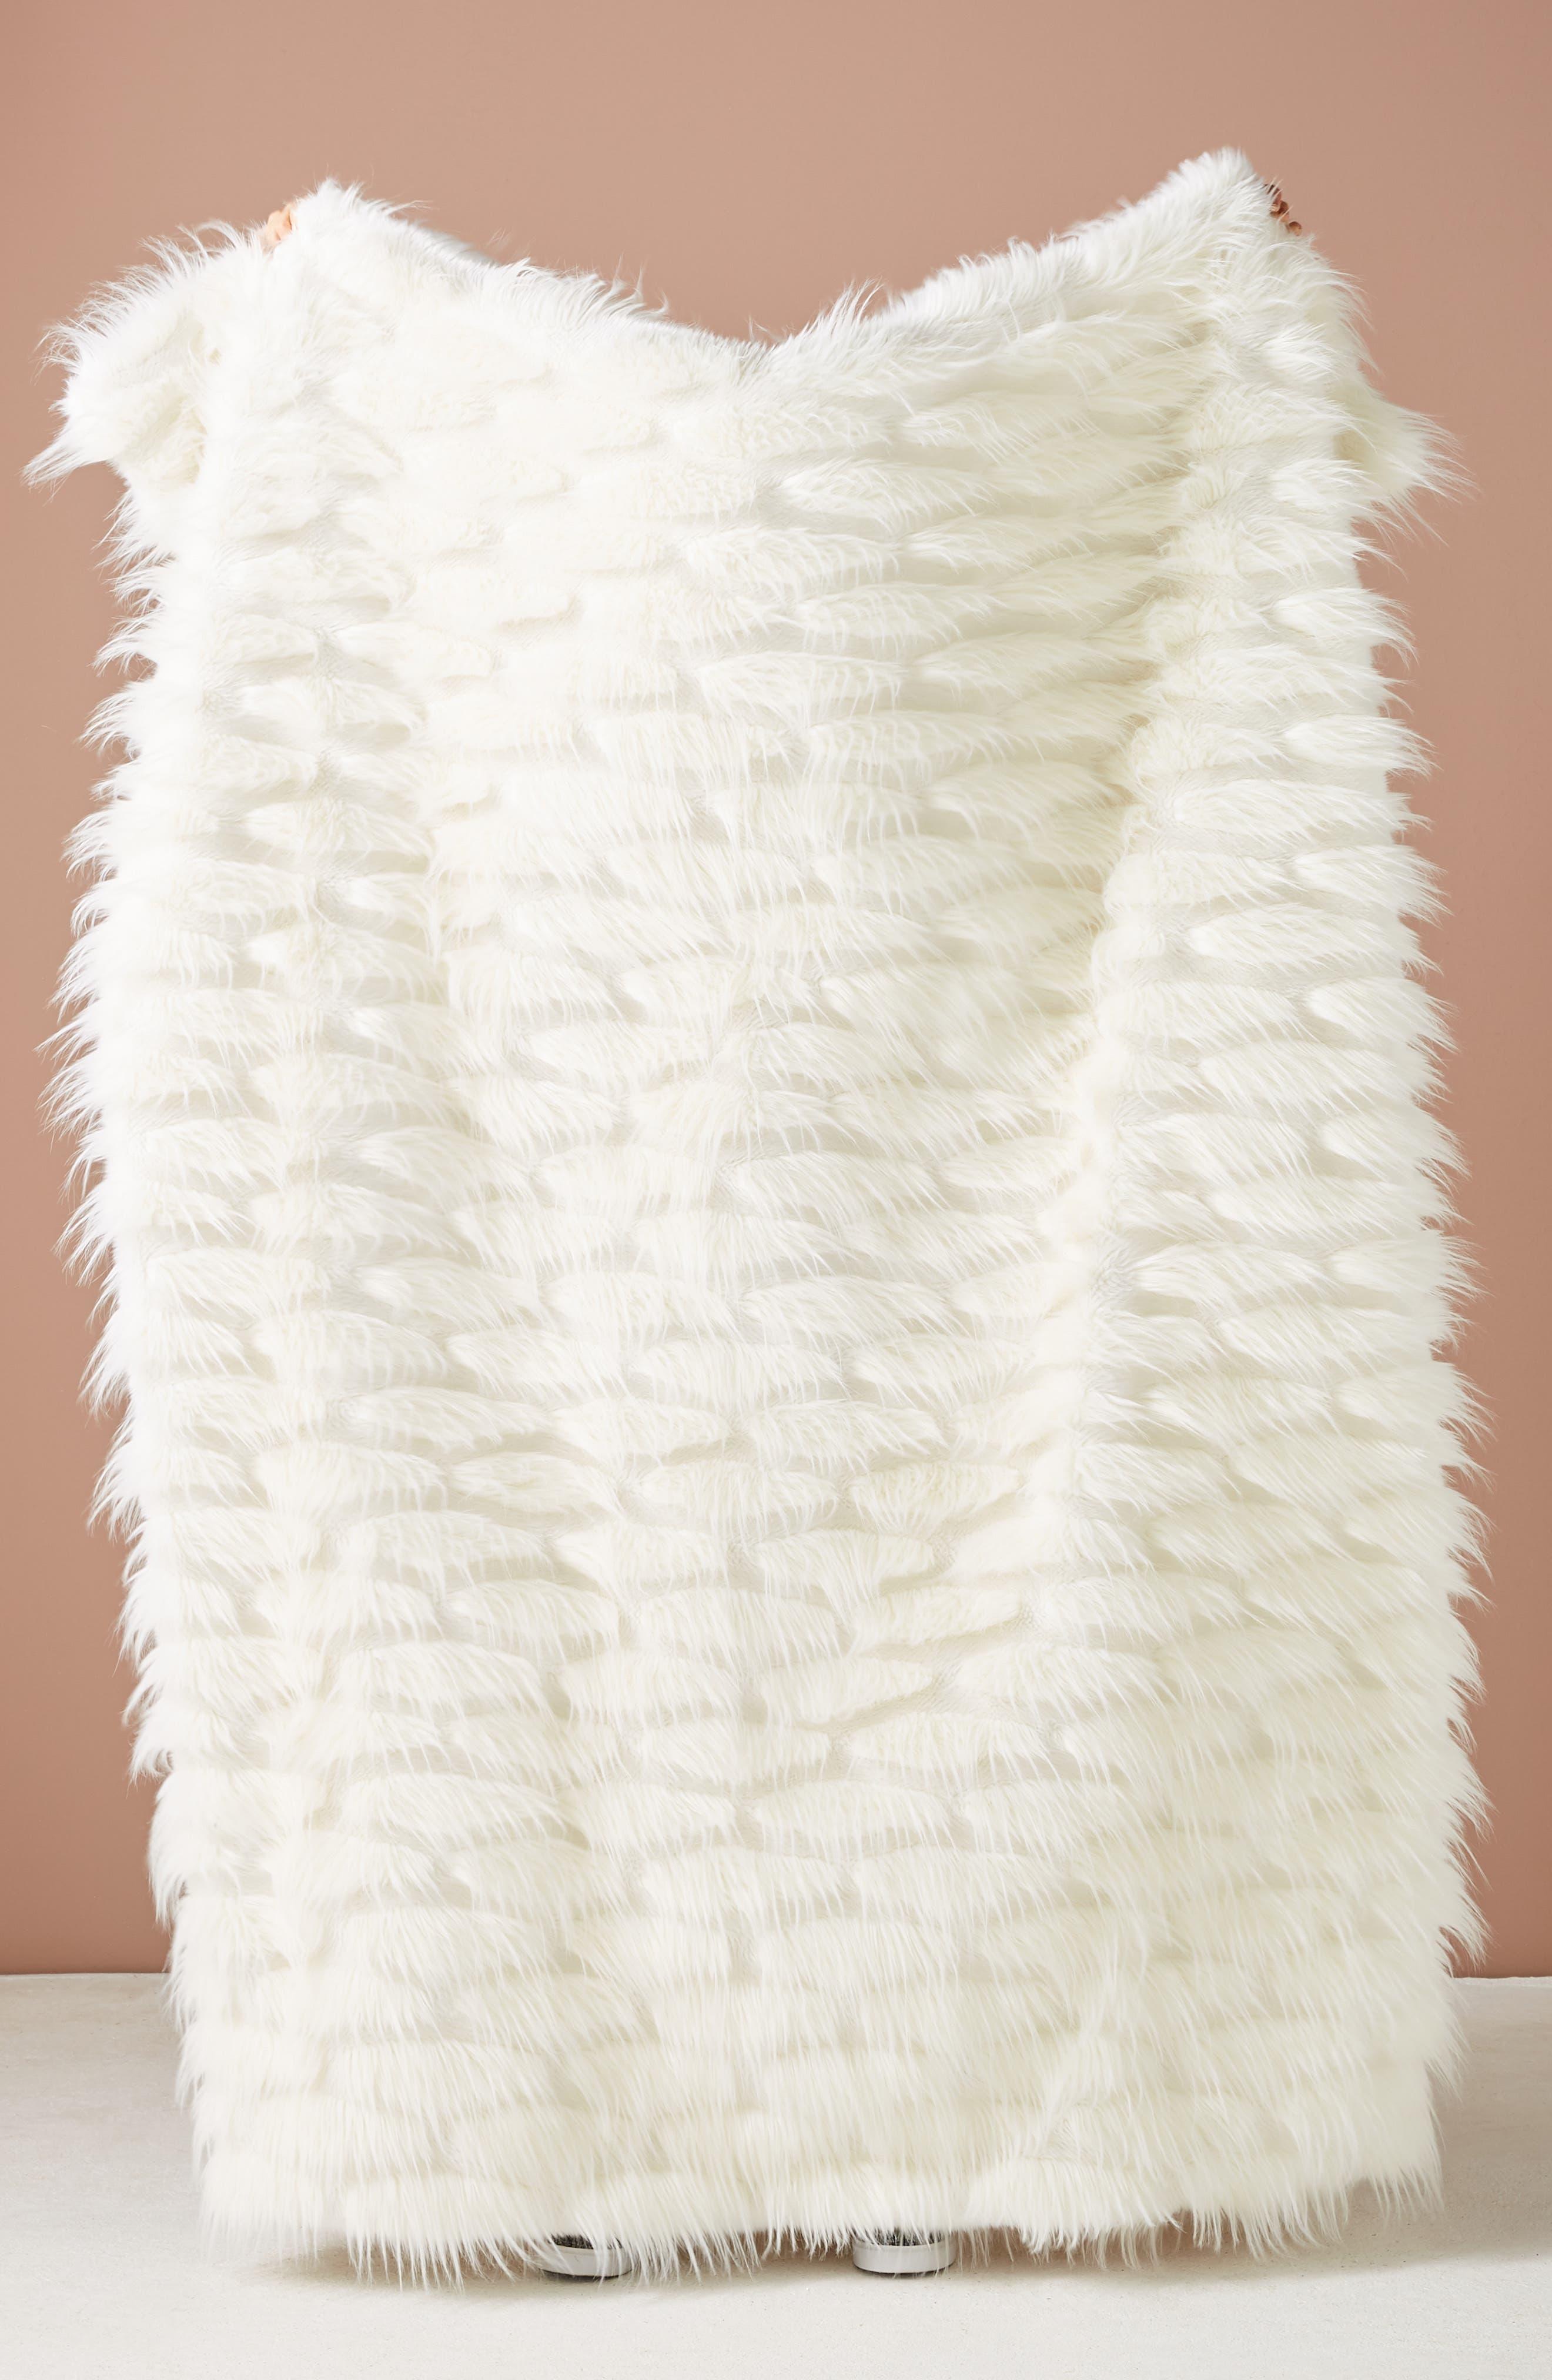 ANTHROPOLOGIE,                             Faux Fur Throw Blanket,                             Main thumbnail 1, color,                             WHITE